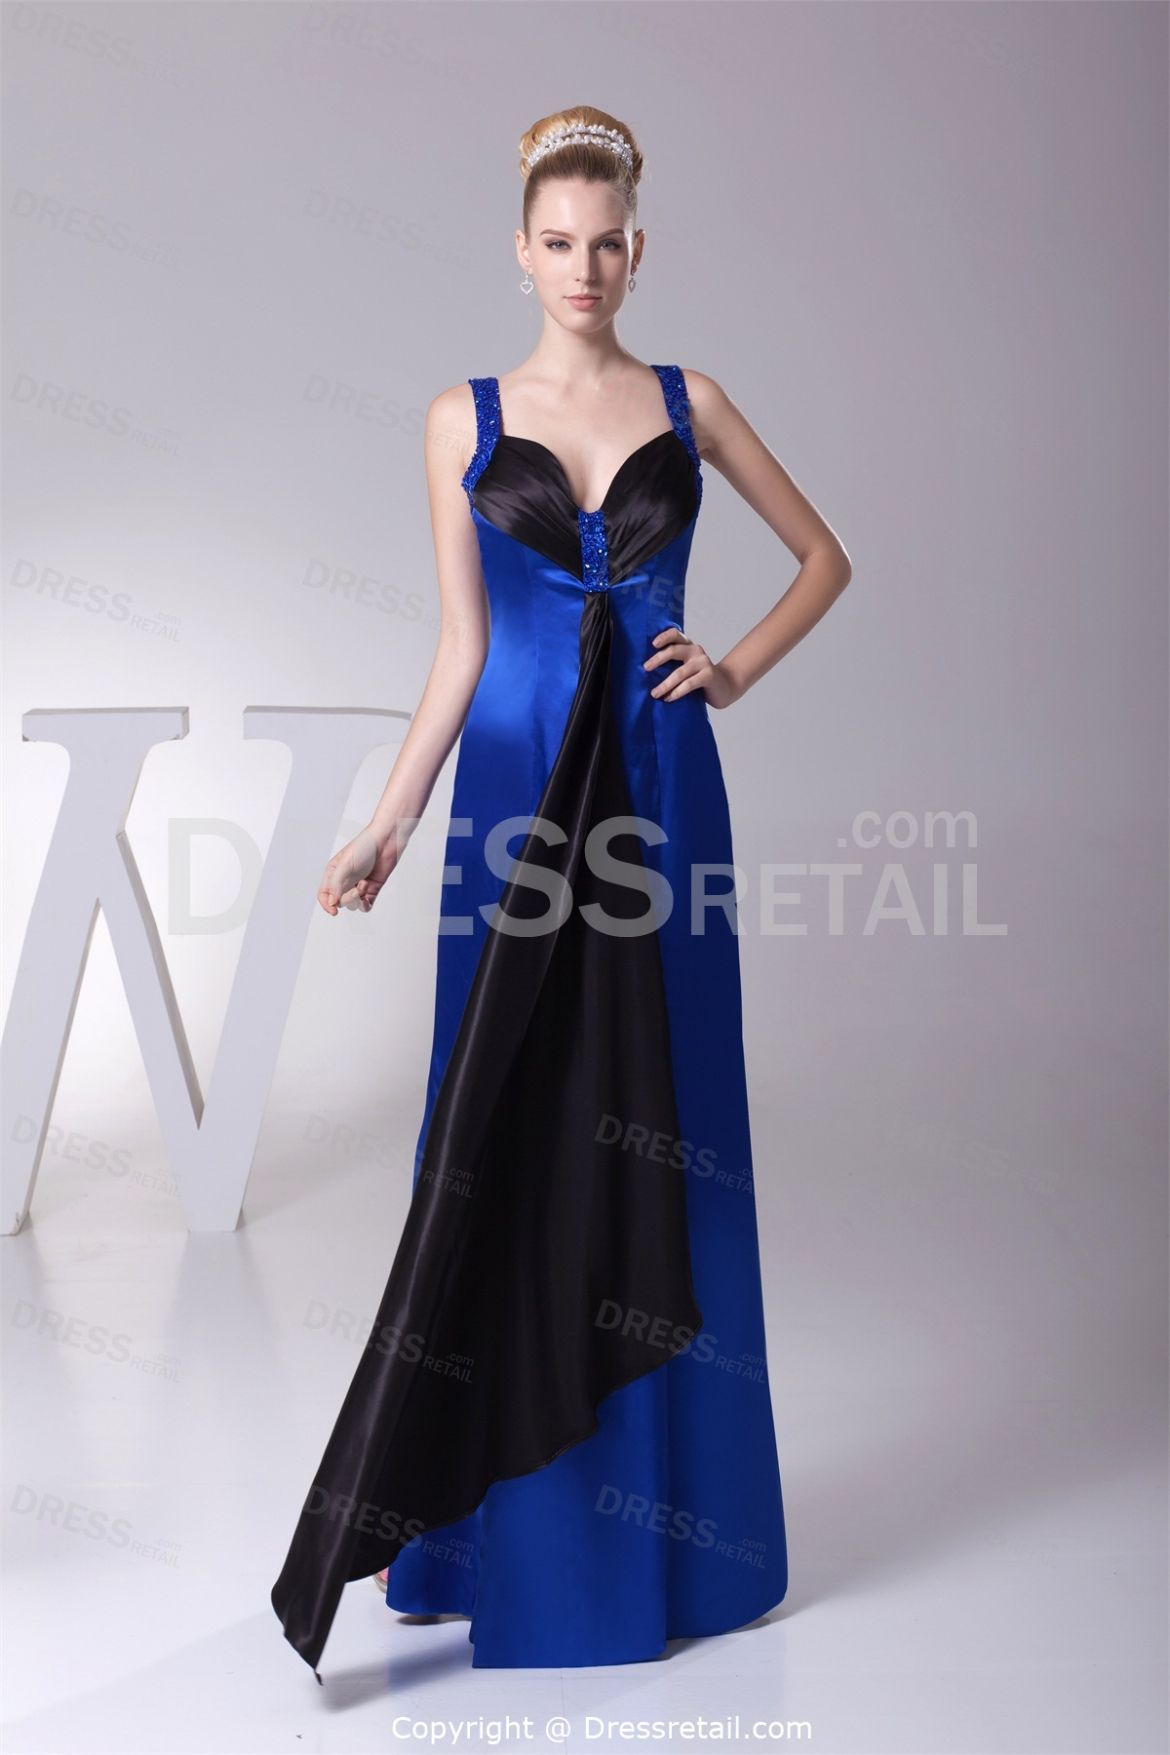 Black and Blue Wedding Dresses Best Dresses for Wedding Check